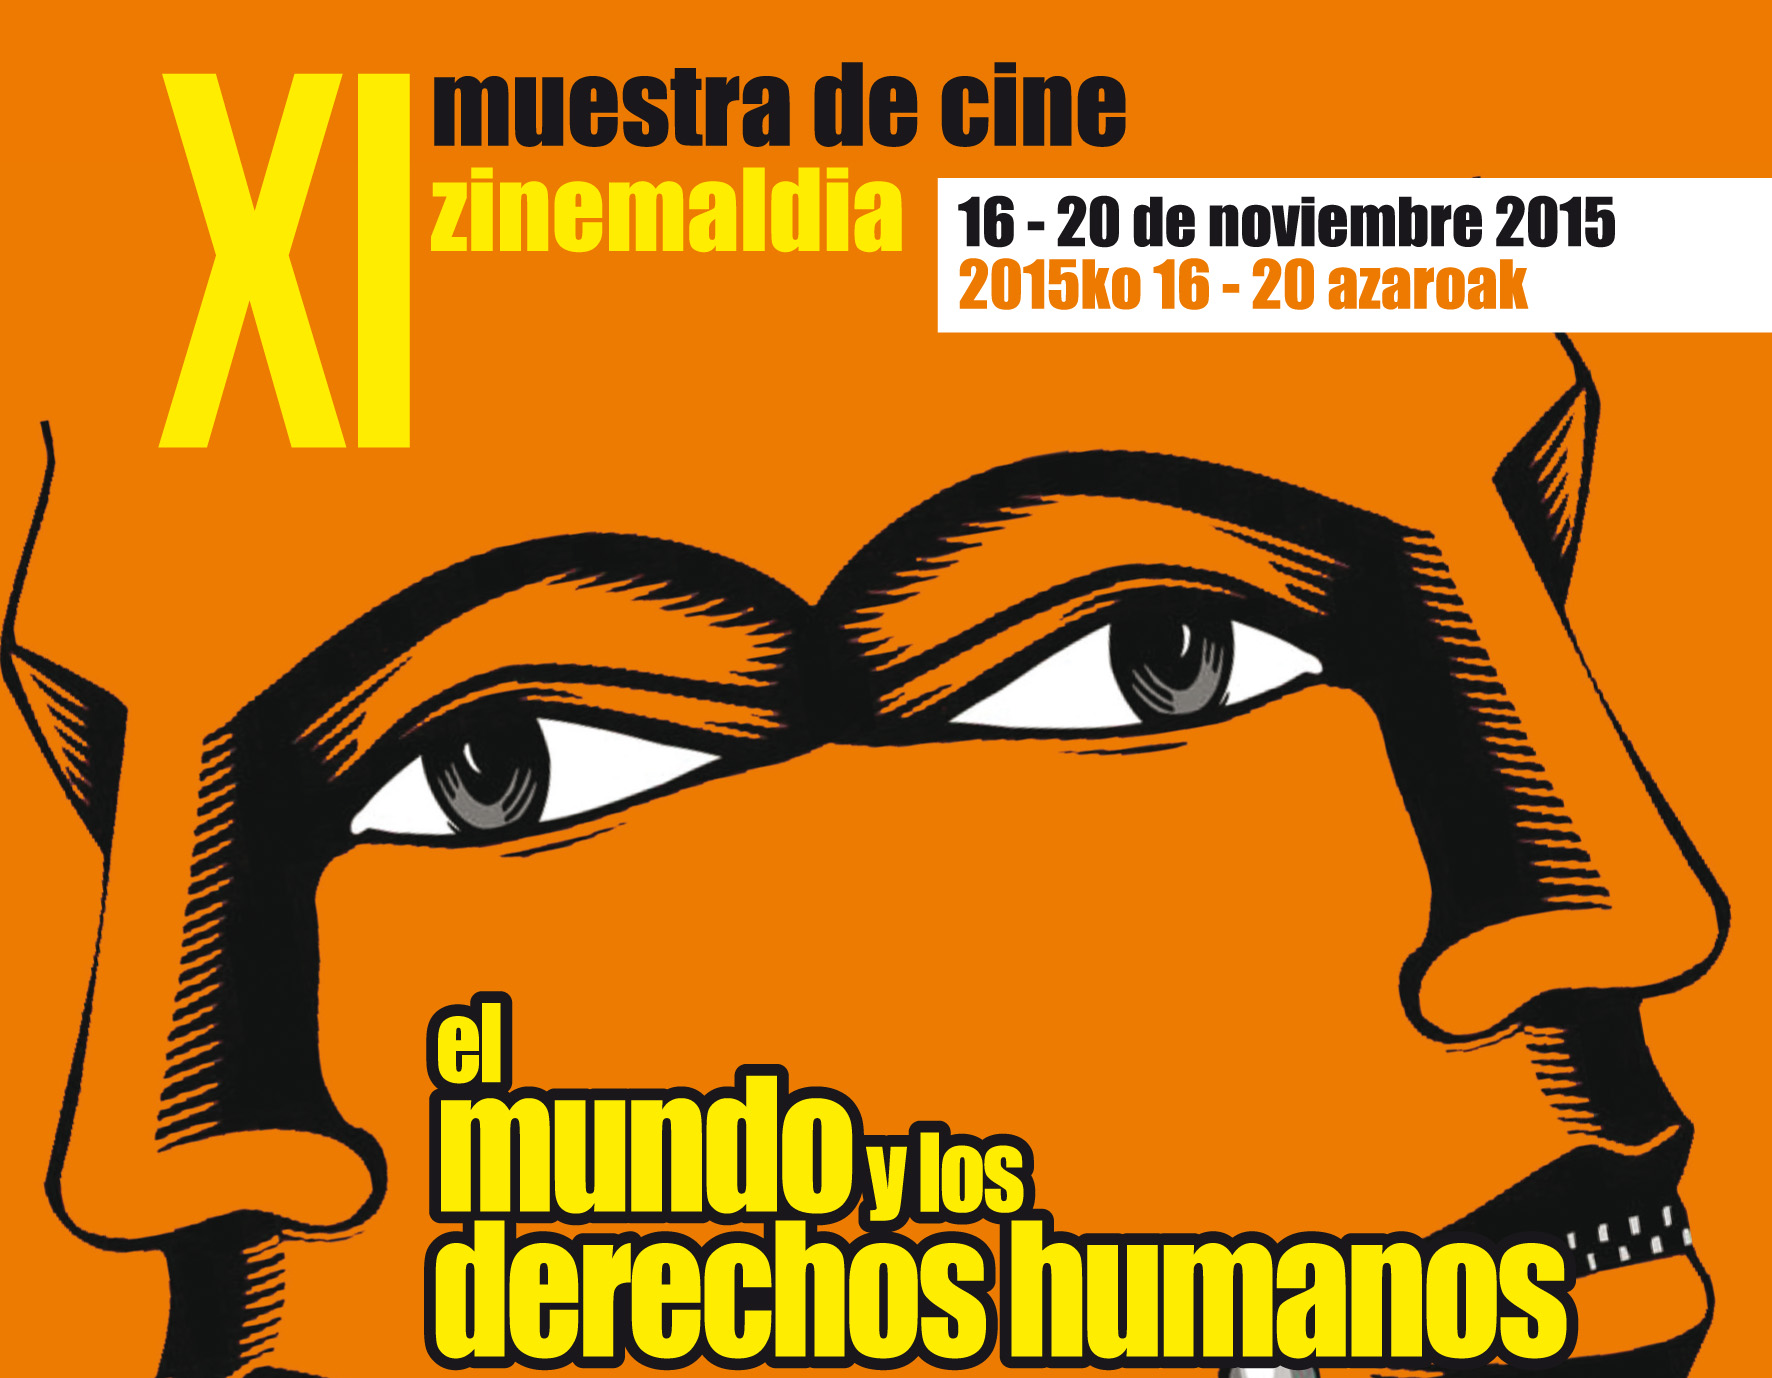 IPES Cine mundo ddhh 2015.fh11